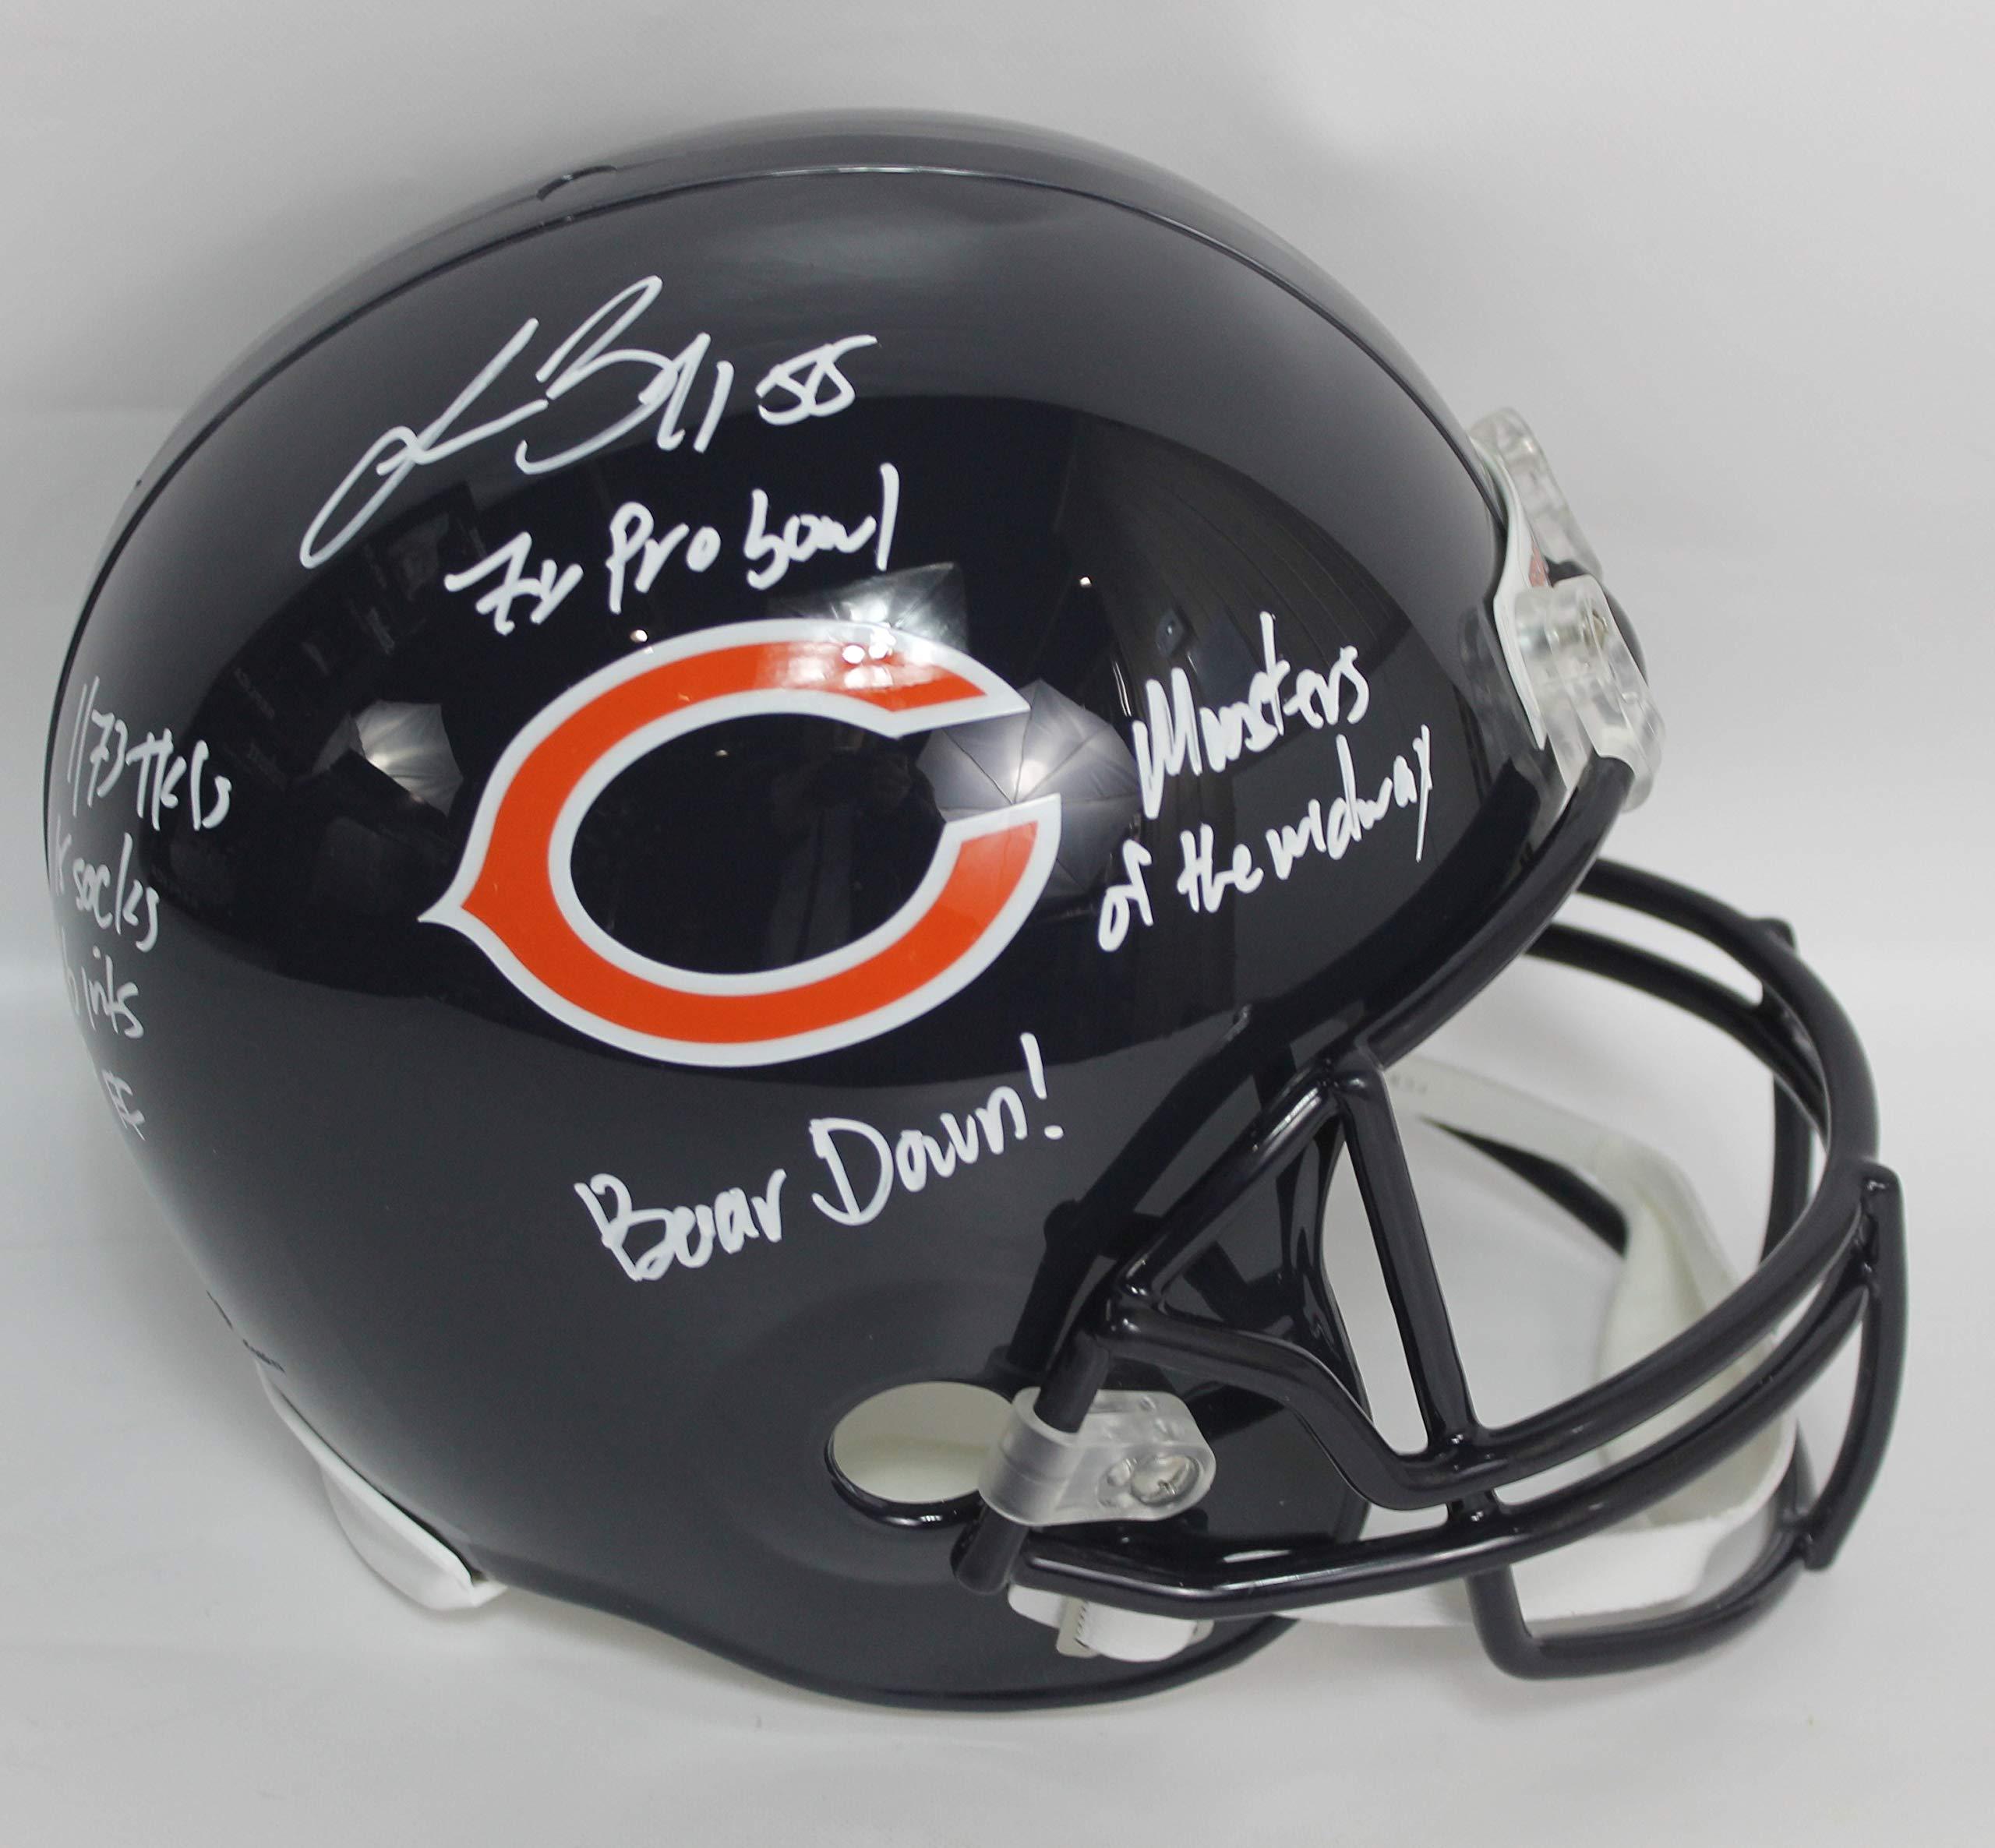 Lance Briggs Autographed Chicago Bears Full Size Riddell Replica Football Helmet w/Inscriptions JSA COA